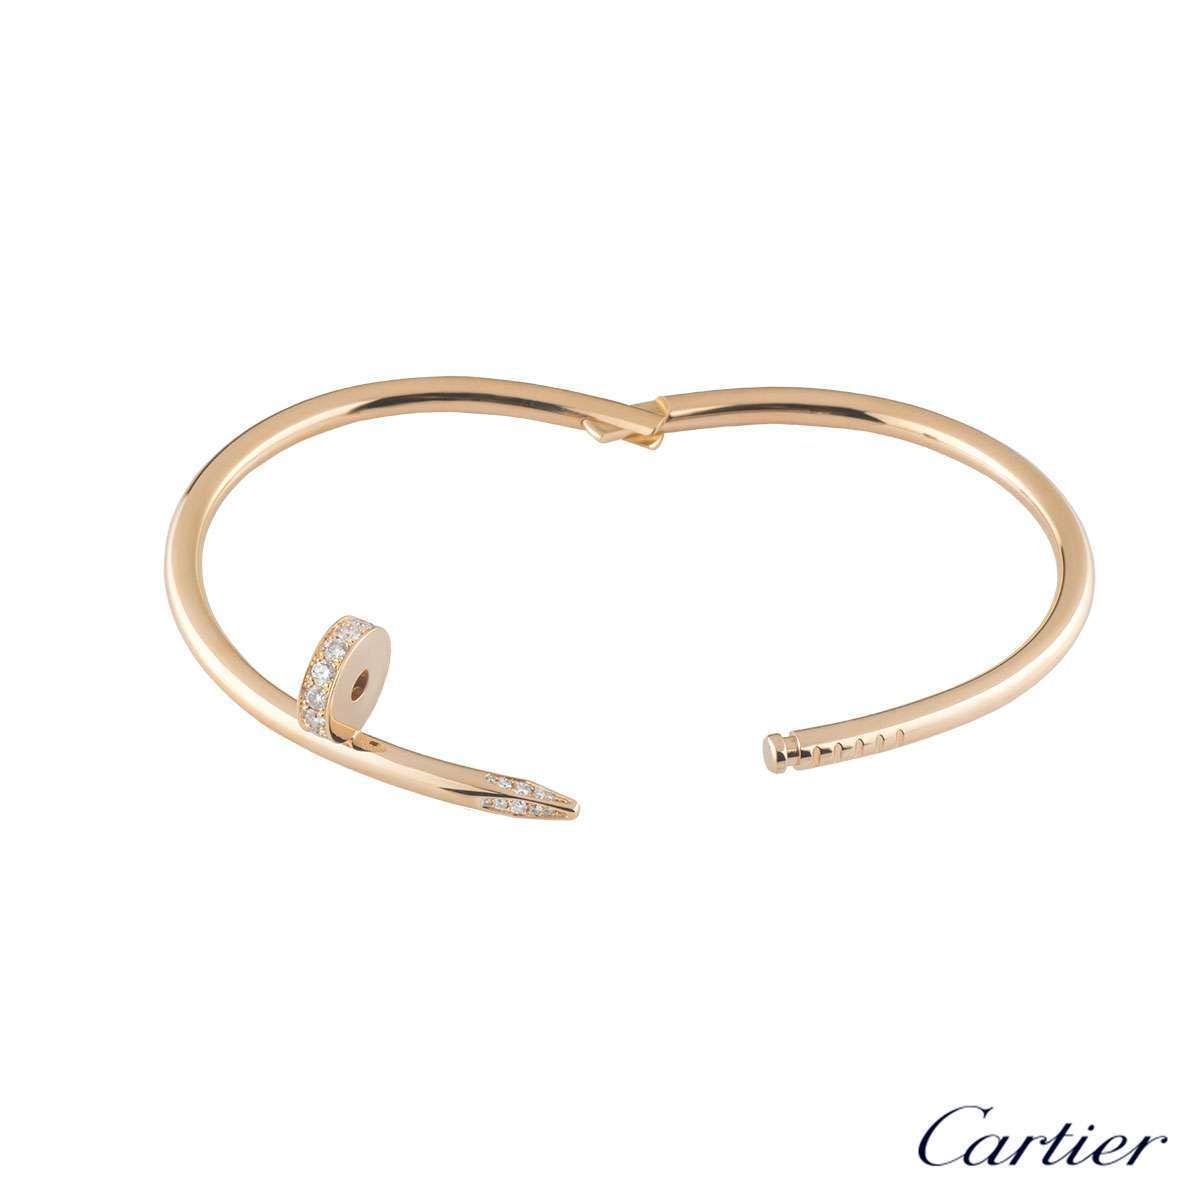 Cartier Rose Gold Diamond Juste Un Clou Bracelet Size 16 B6048516